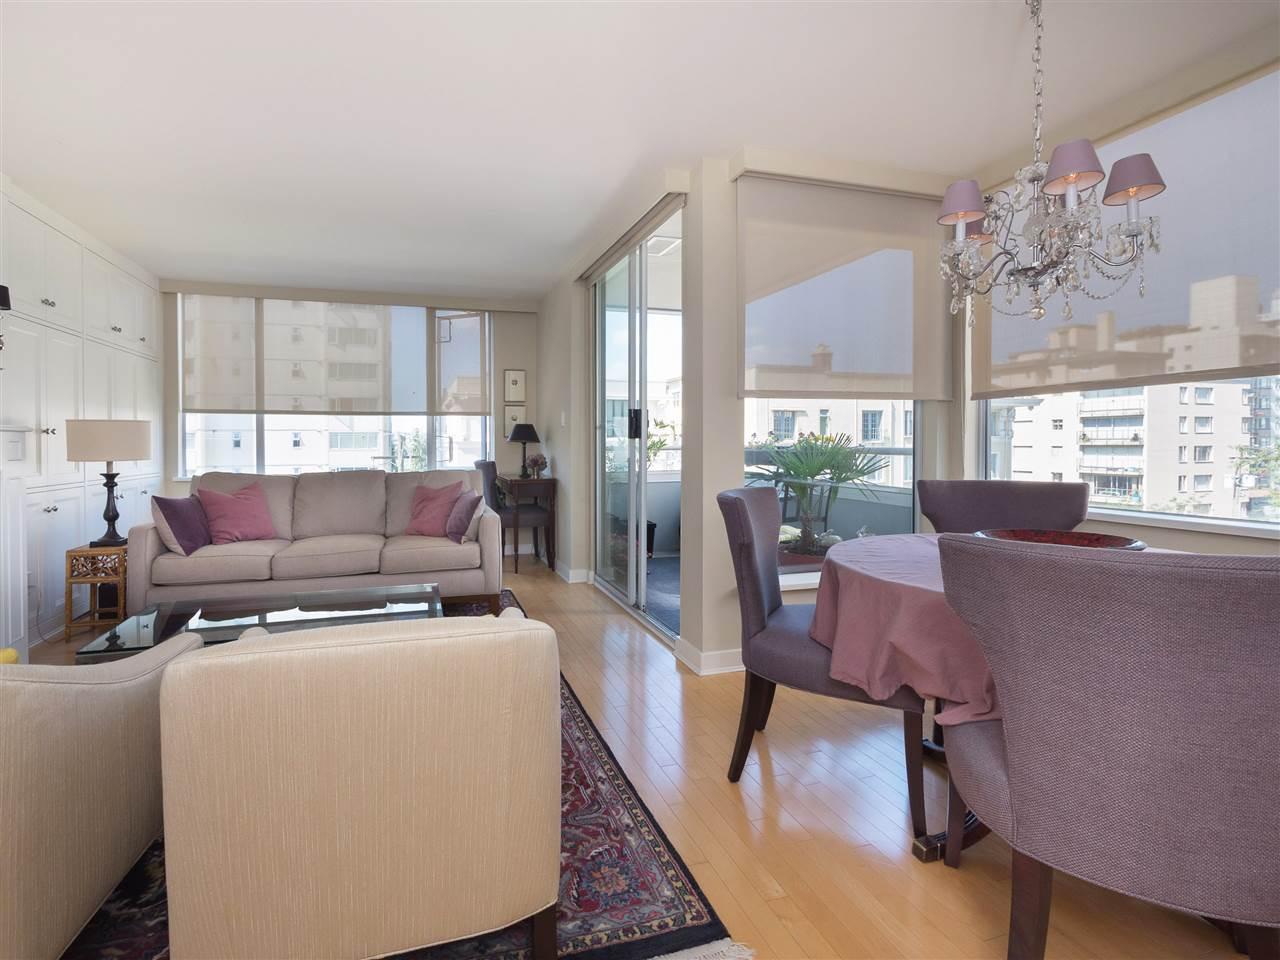 Condo Apartment at 303 1436 HARWOOD STREET, Unit 303, Vancouver West, British Columbia. Image 1